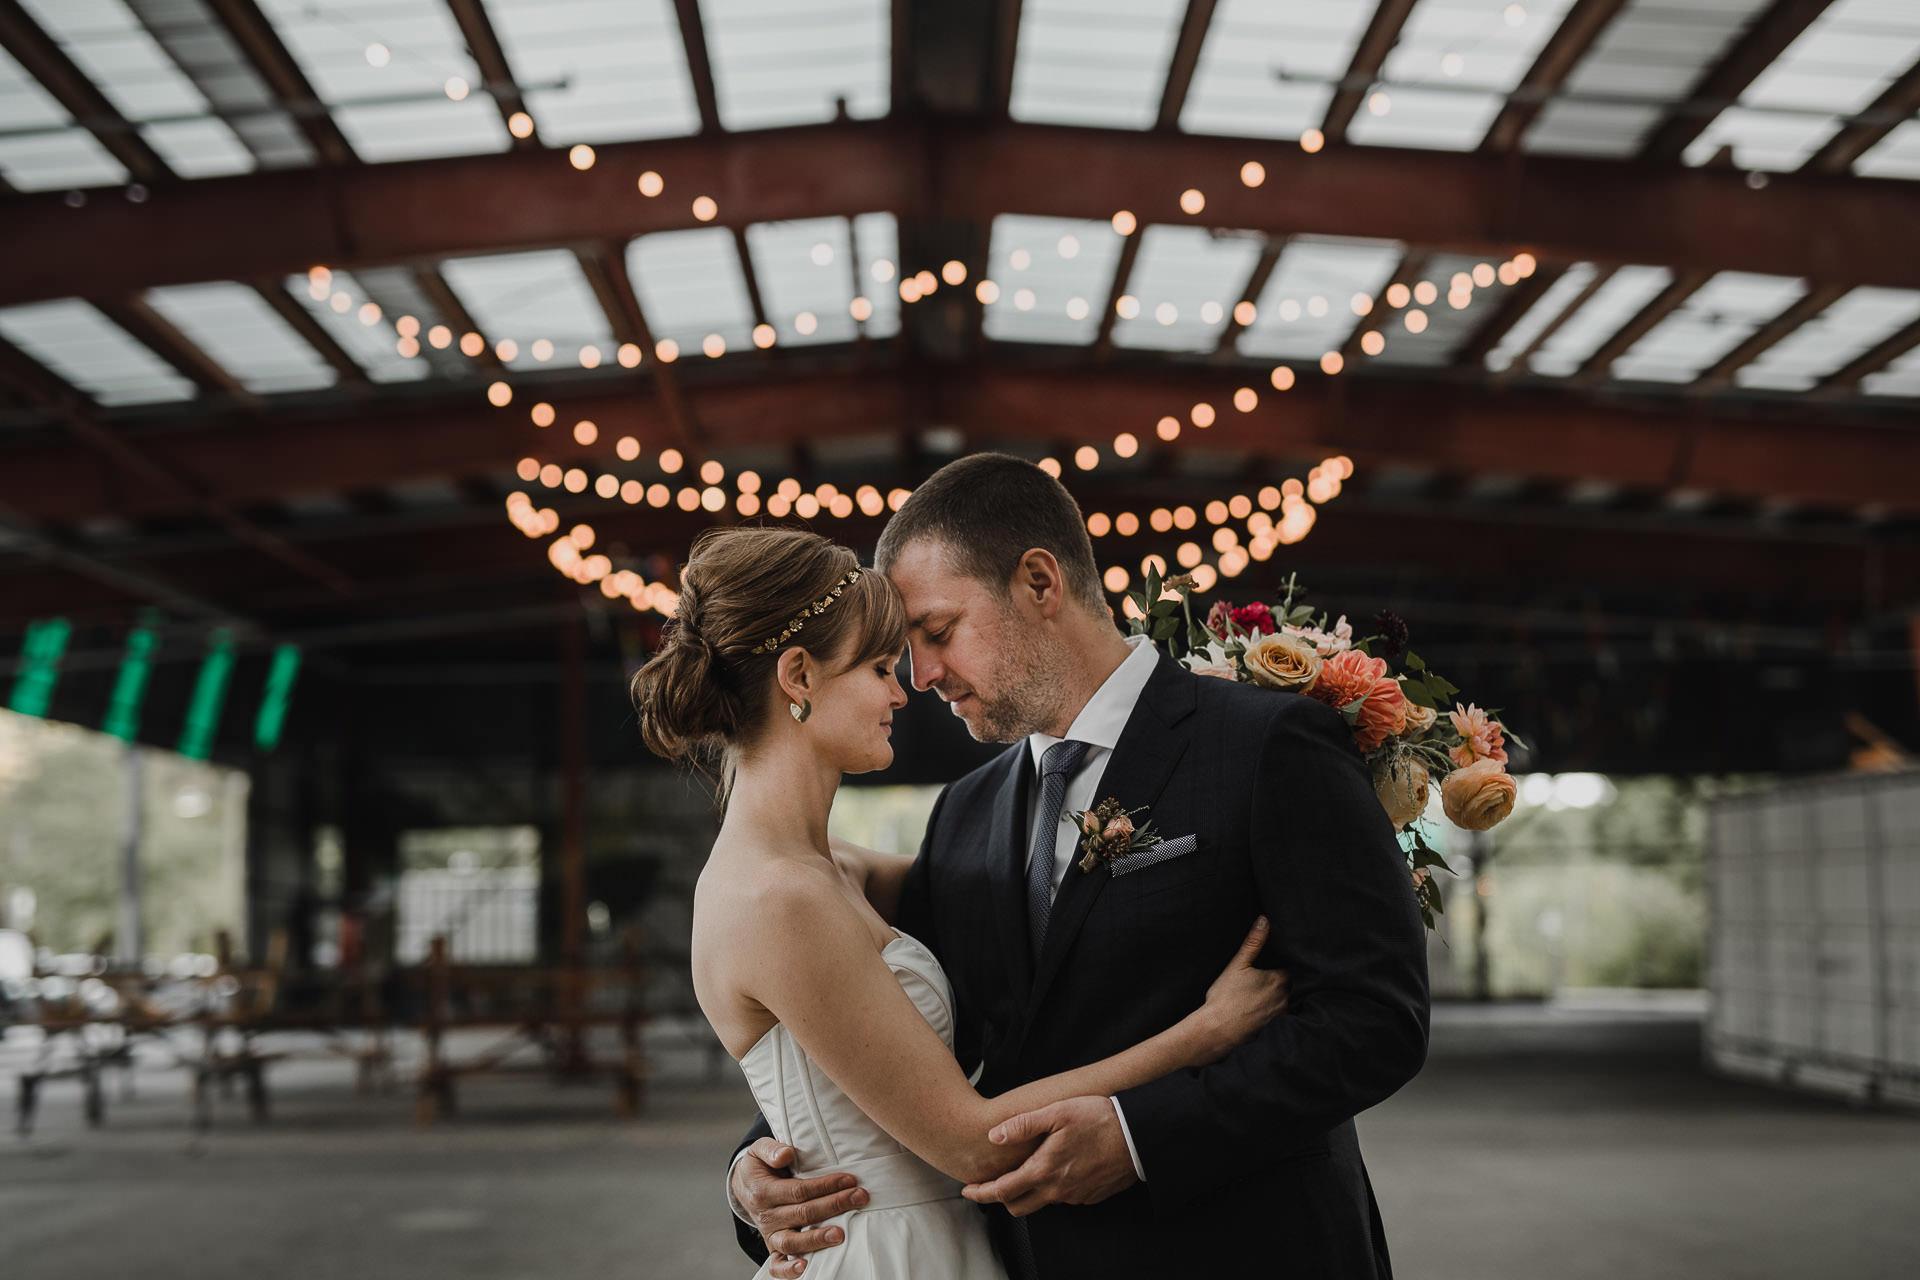 Evergreen Brickworks wedding photographer - urban wedding portrait